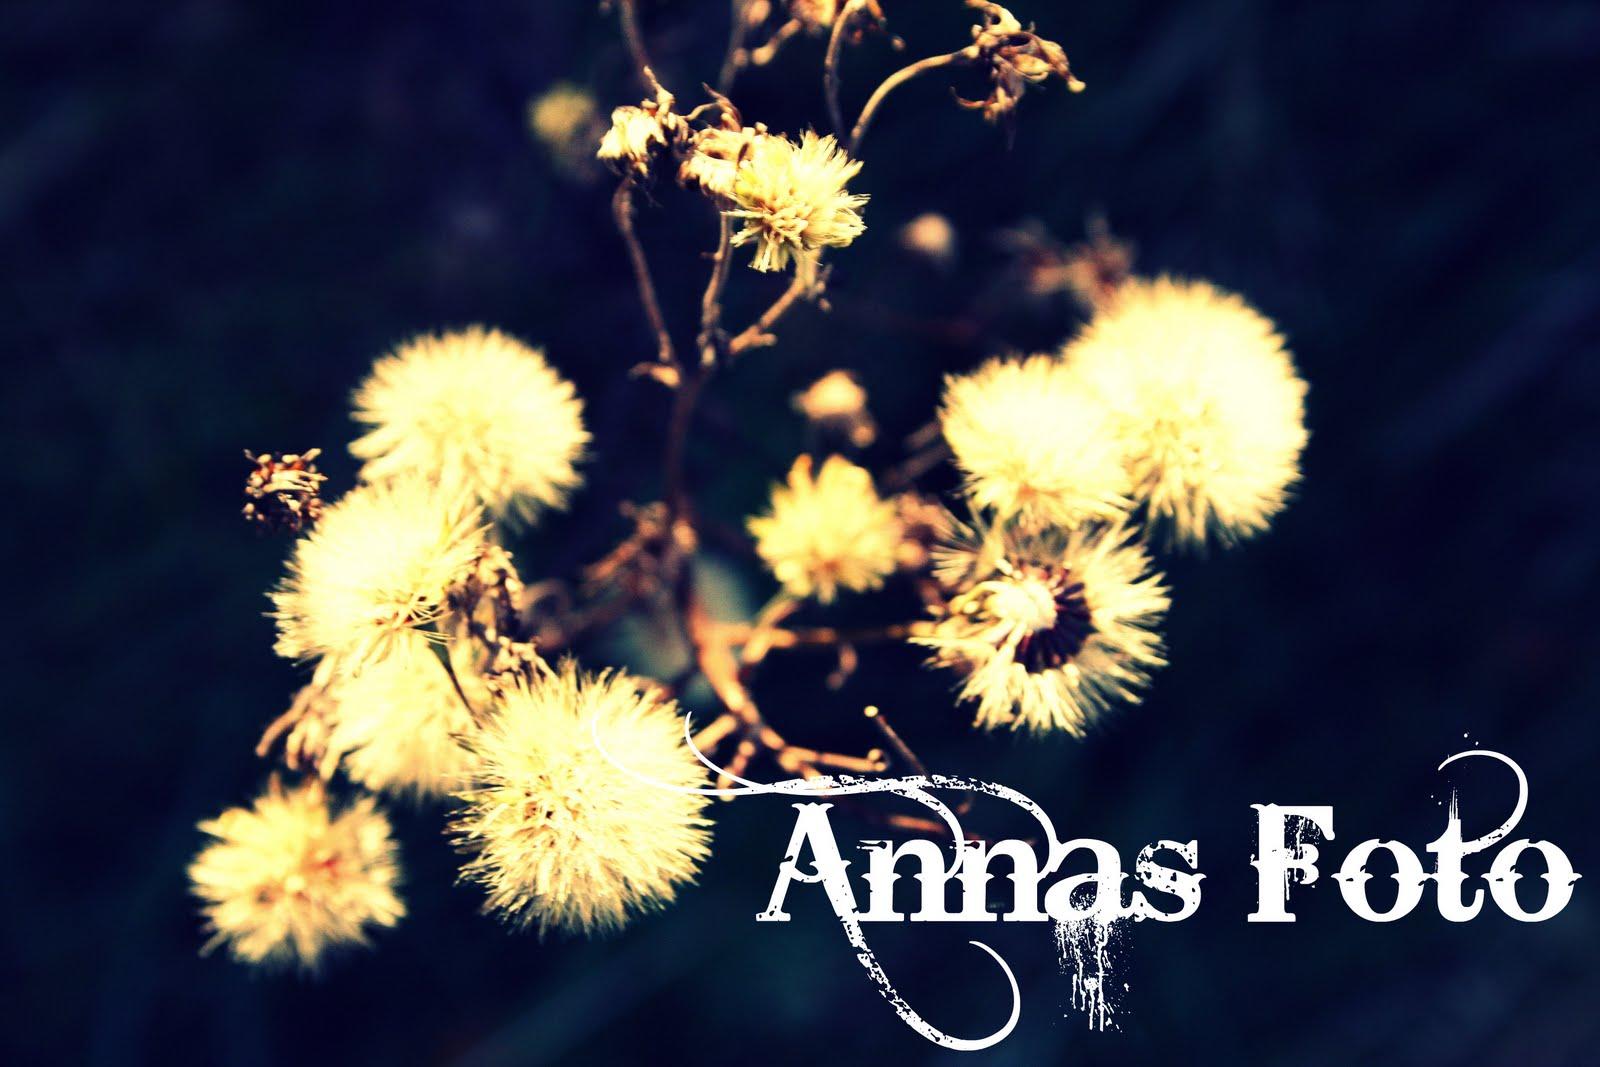 Annas foto